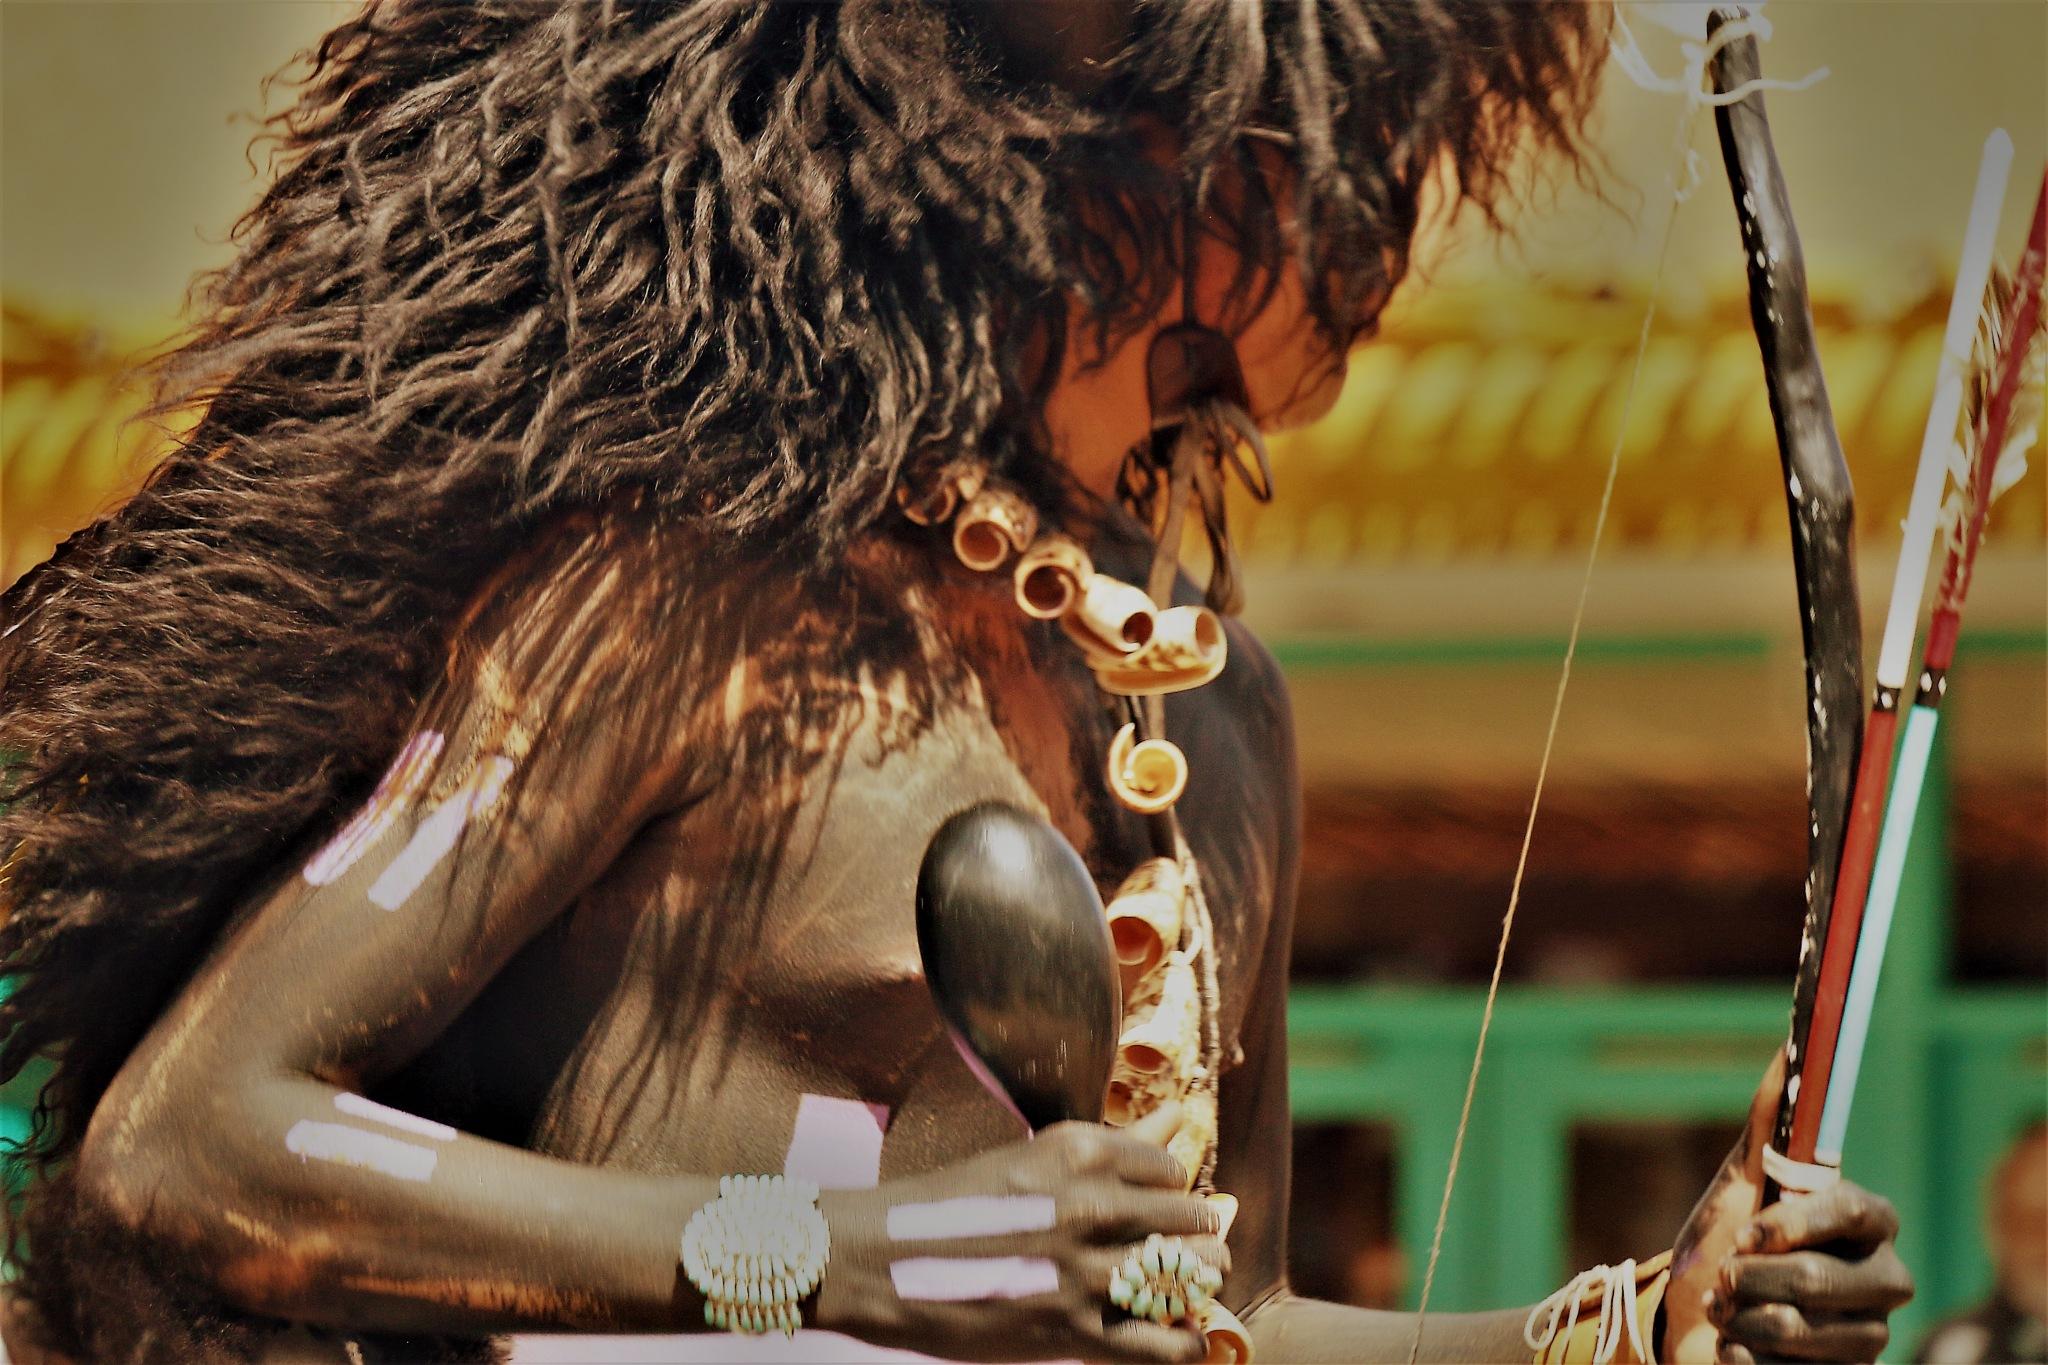 Acoma Buffalo Dancer by tery.robertson